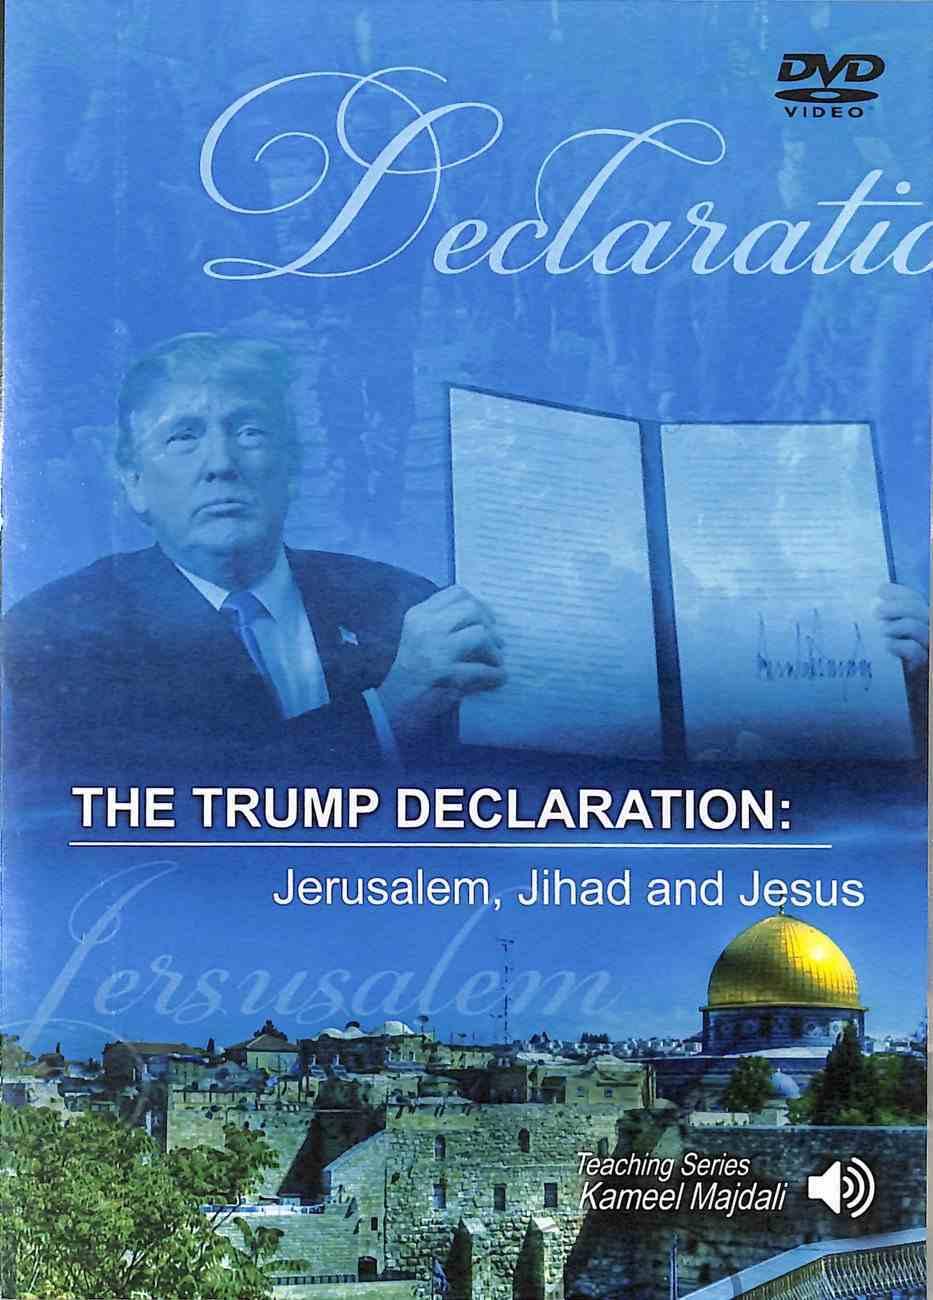 The Trump Declaration: Jerusalem, Jihad and Jesus DVD